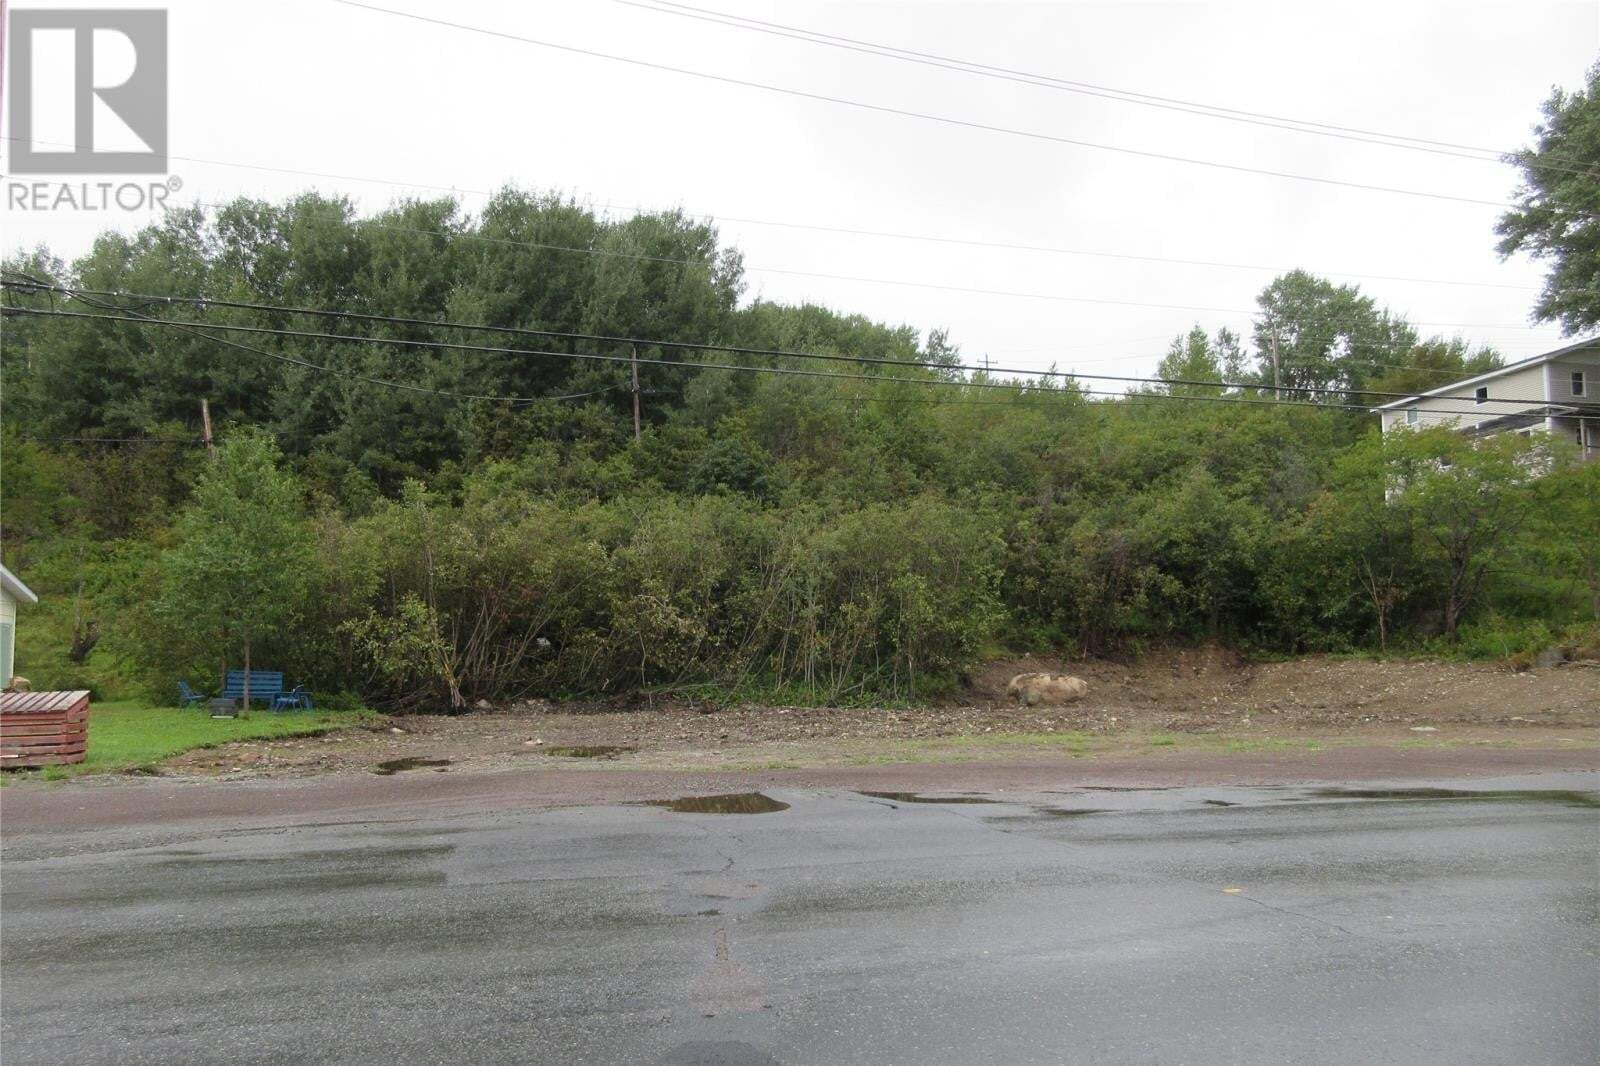 Home for sale at 376 Main St Bishop's Falls Newfoundland - MLS: 1220692